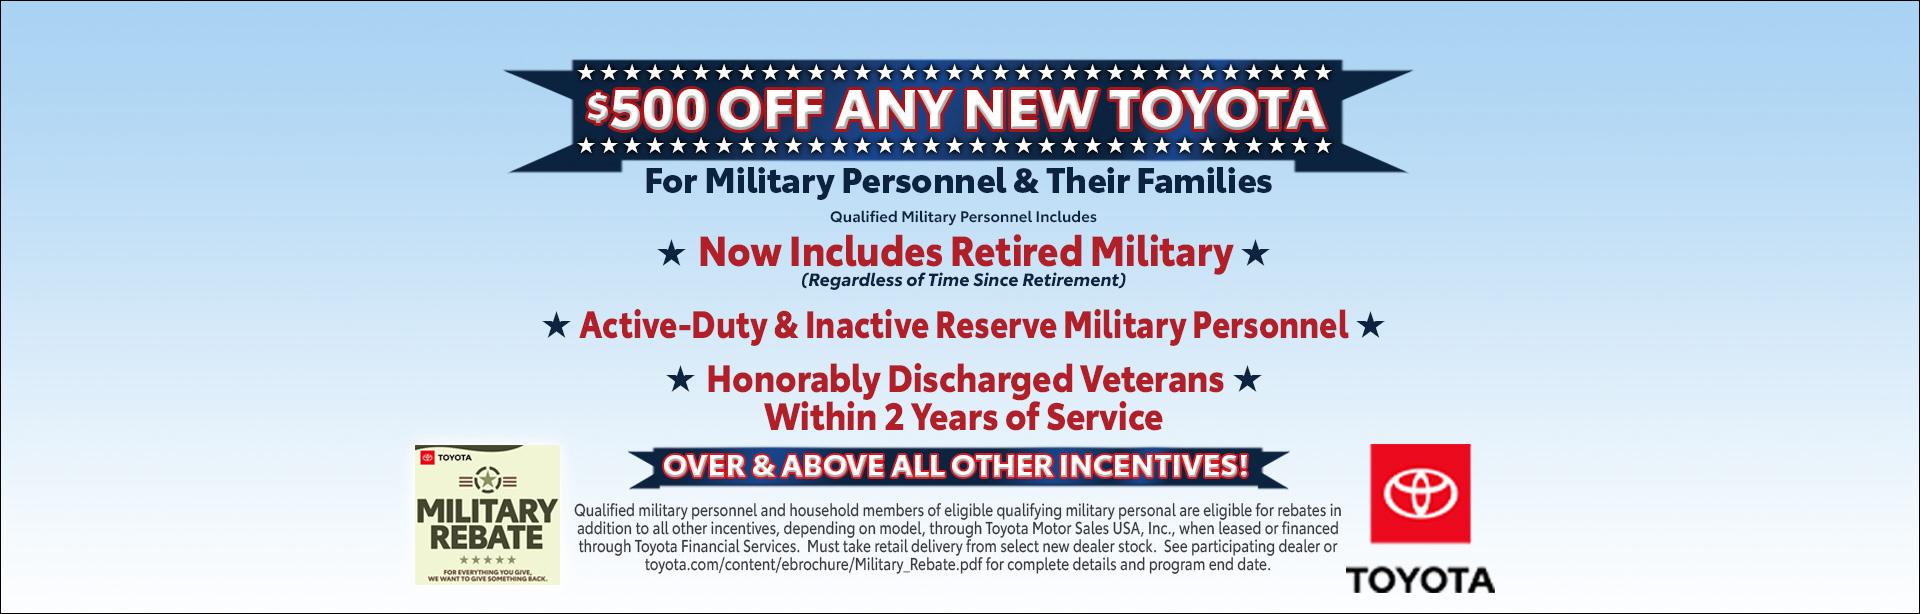 02-21_01_Cincinnati-February-2021-CIN-Military-Rebate_1920x614_fa32_All-Models_O_xta.jpeg